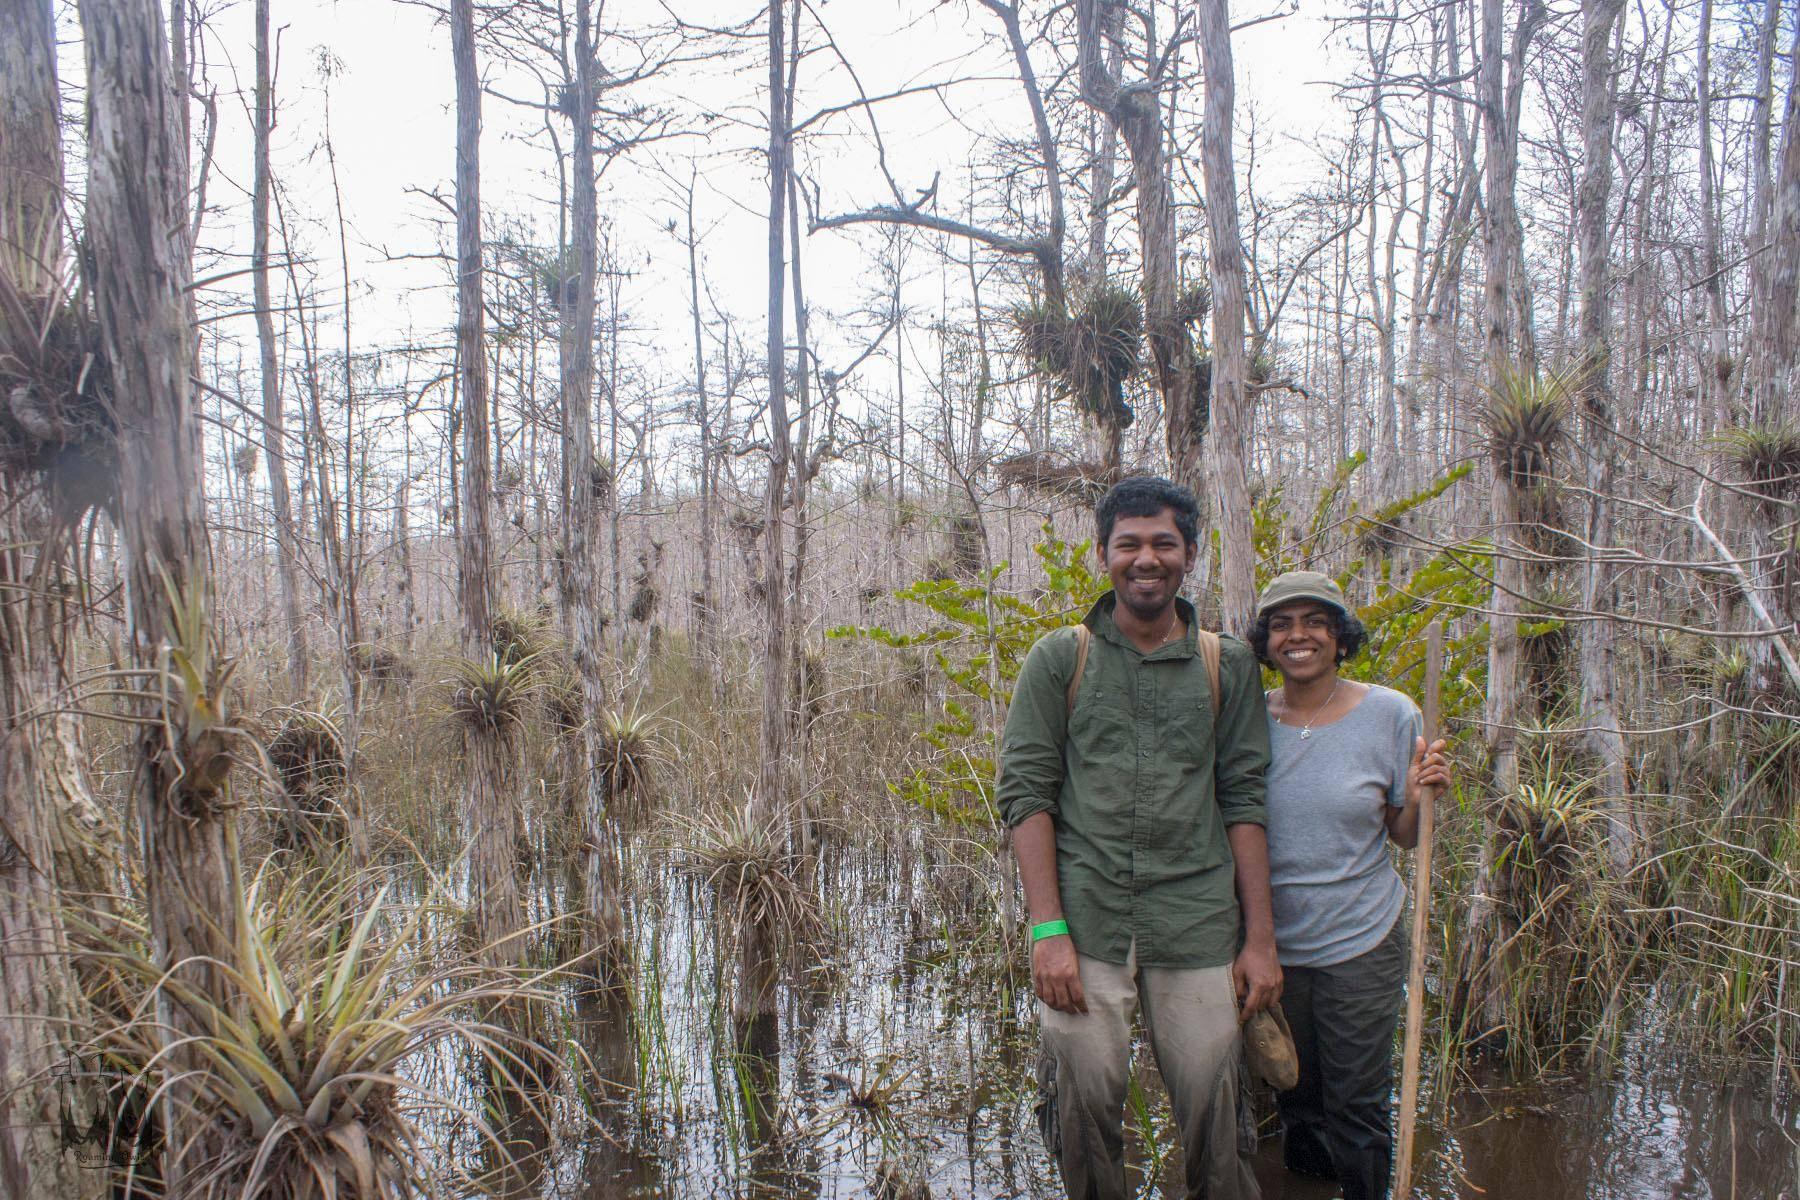 Vinod Sadhasivan in Everglades,Paulmathi Vinod,Everglades Cypress Swamp Walk,Clyde Butcher Swamp Walk